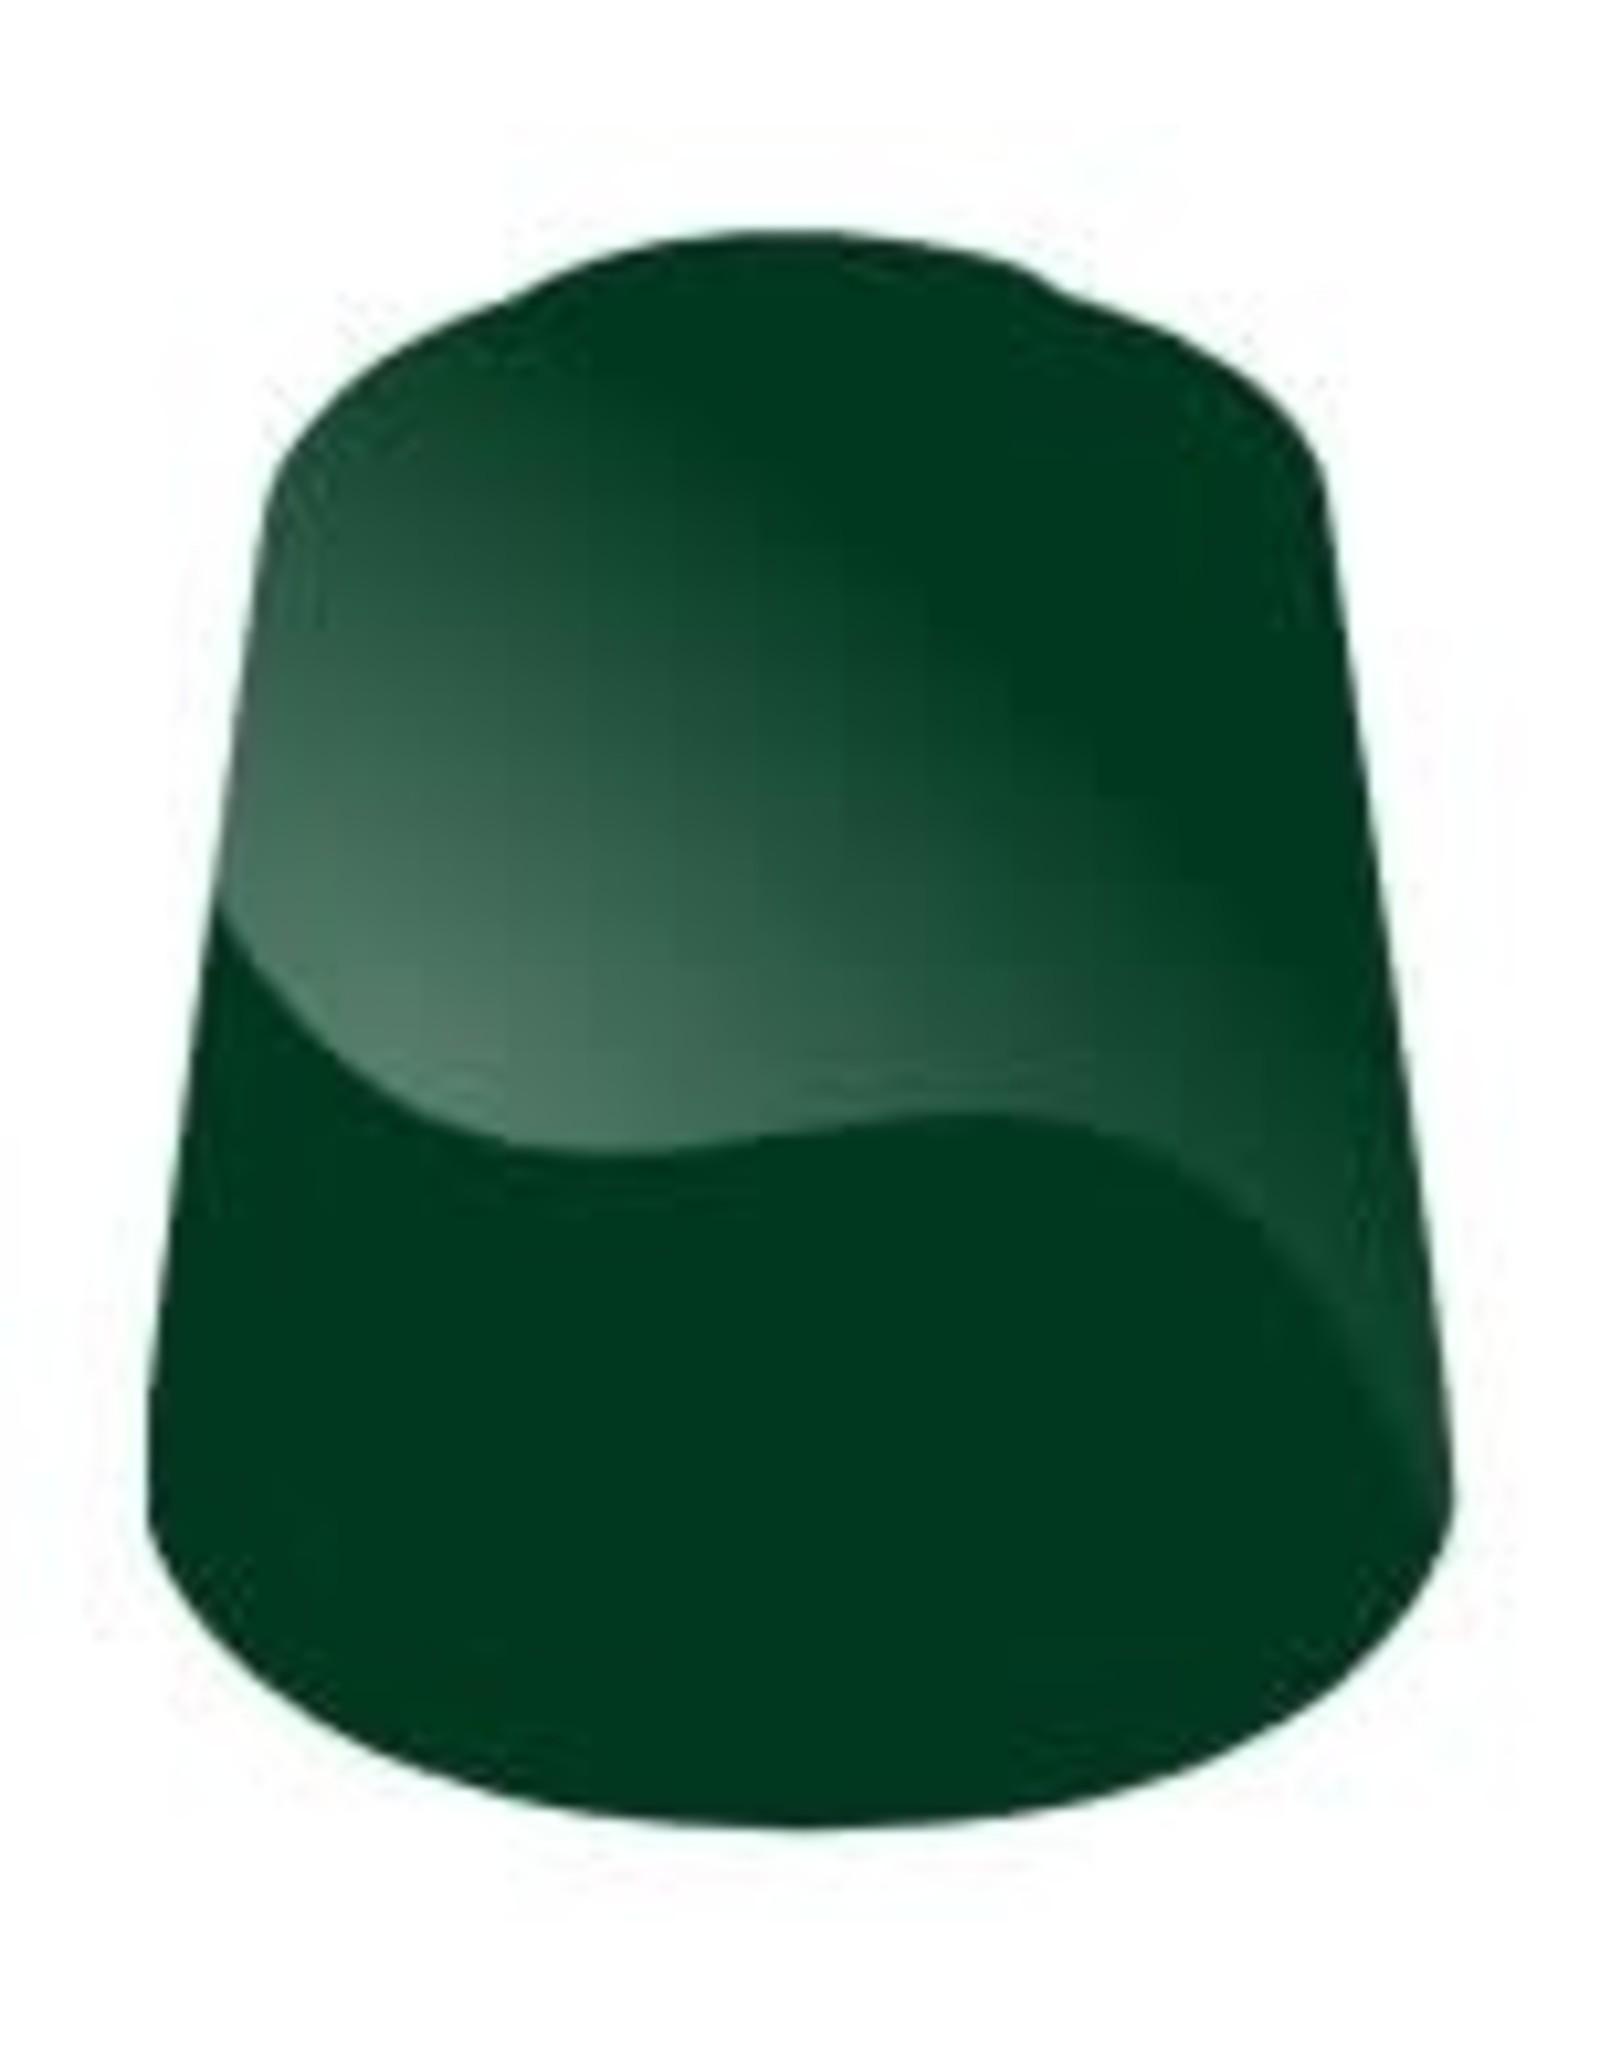 Games Workshop Citadel - Technical: Waystone Green (12 ml)